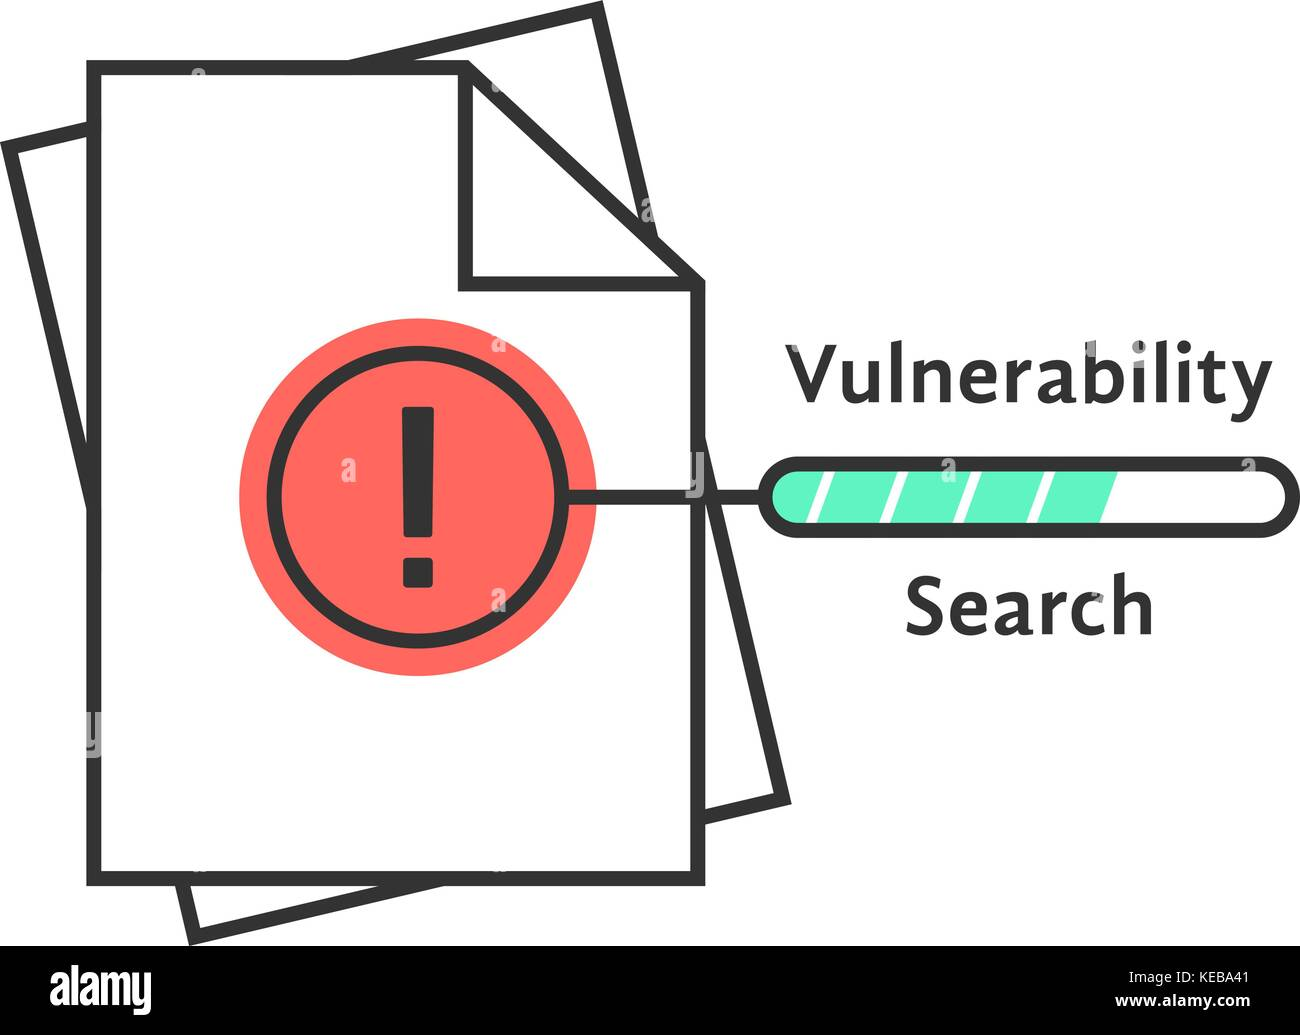 vulnerability search thin line icon - Stock Vector